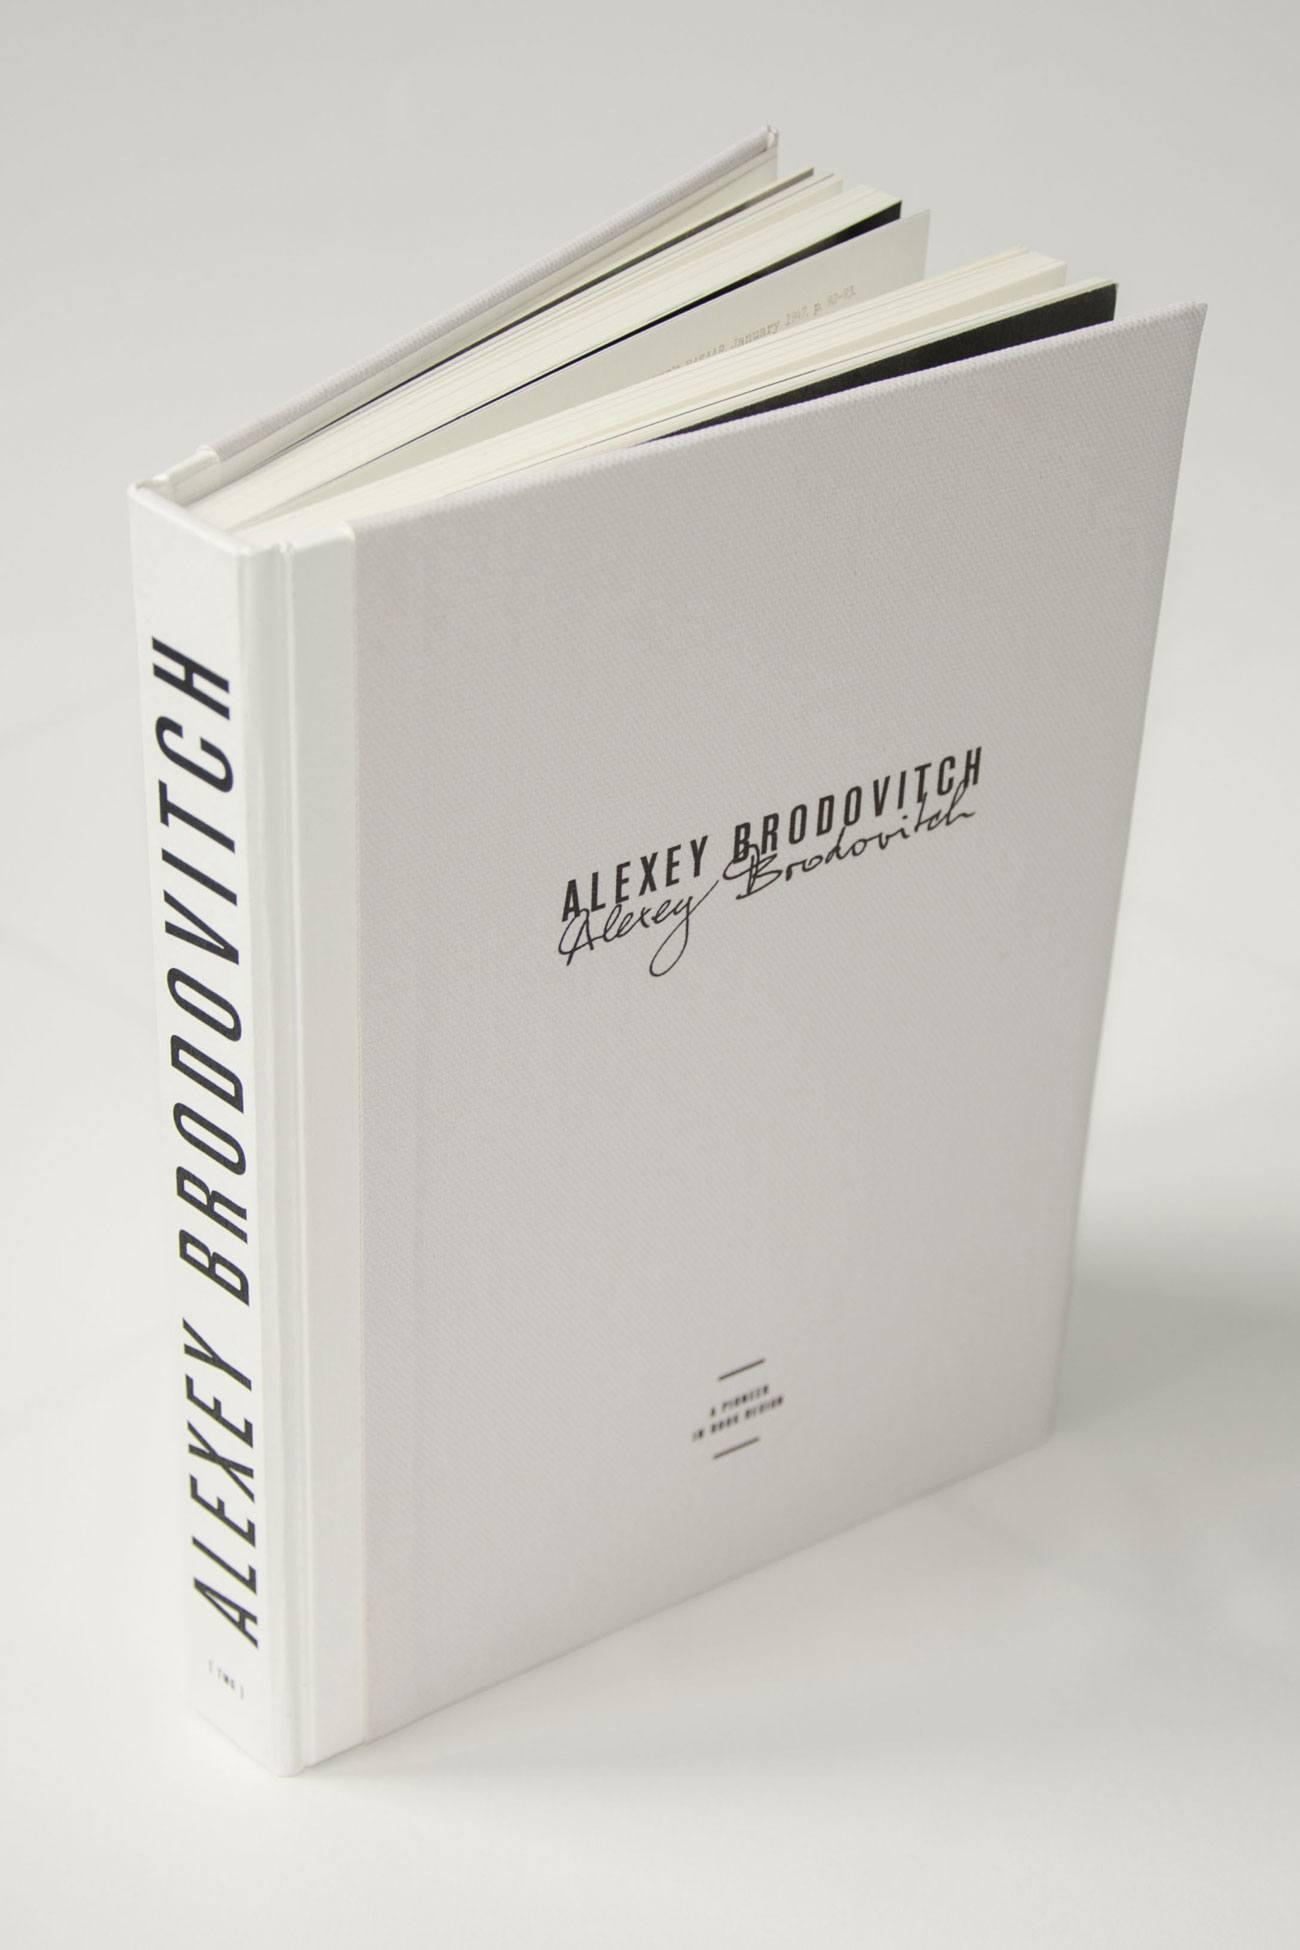 NDU_ULG-Buchgestaltung_04_Grassinger1